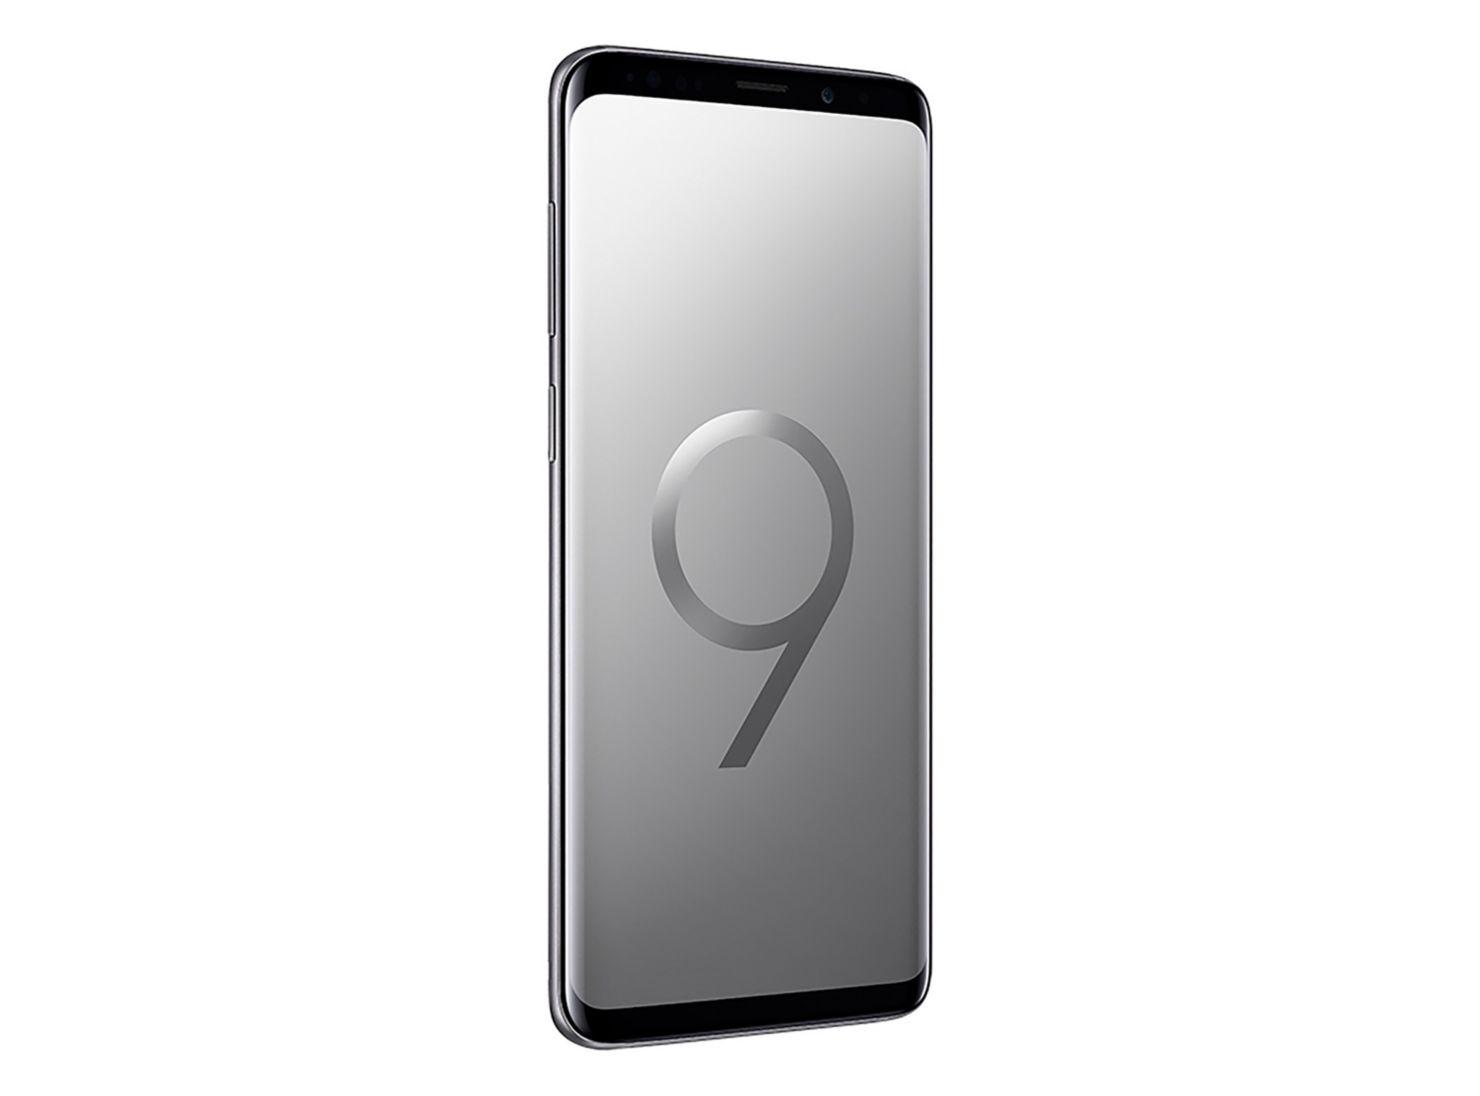 Galaxy Gris Samsung Plus Smartphone Liberado S9 3RAjq4L5